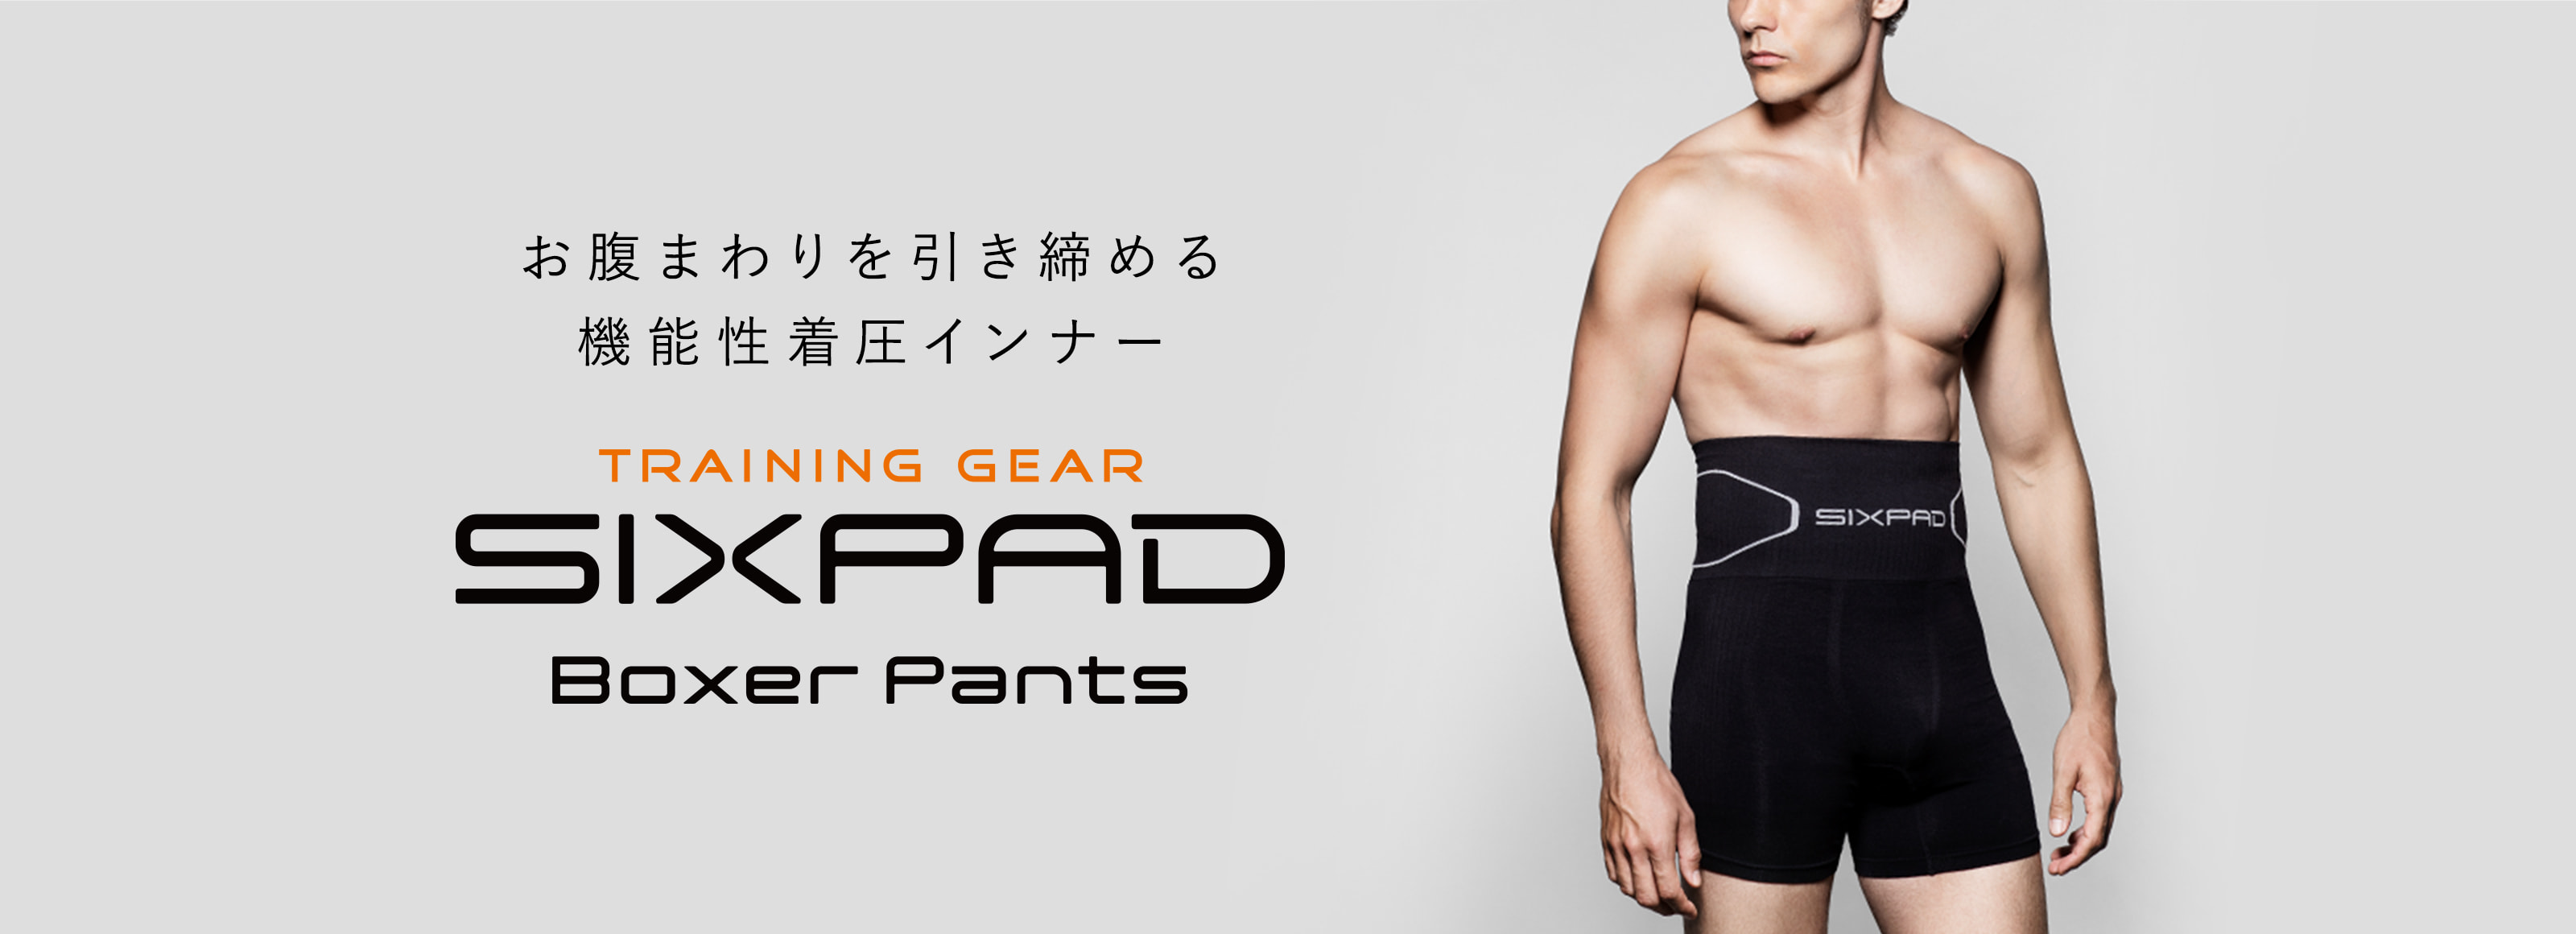 SXIPAD Boxer Pants お腹まわりを引き締める機能性着圧インナー